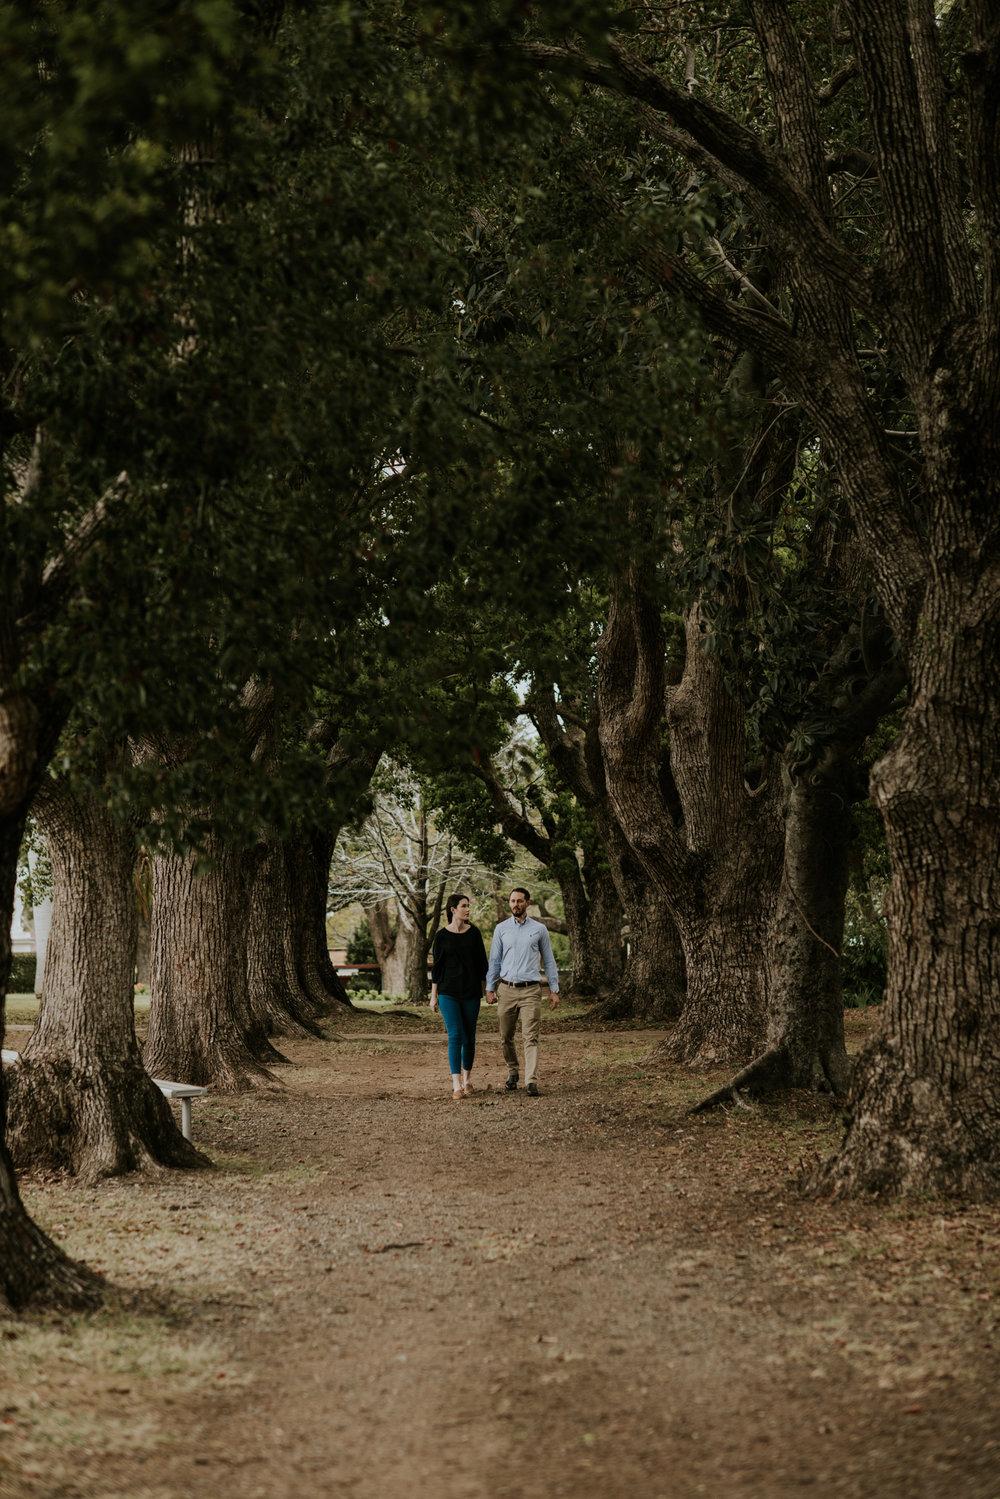 Brisbane Wedding Photographer | Engagement-Elopement Photography-9.jpg